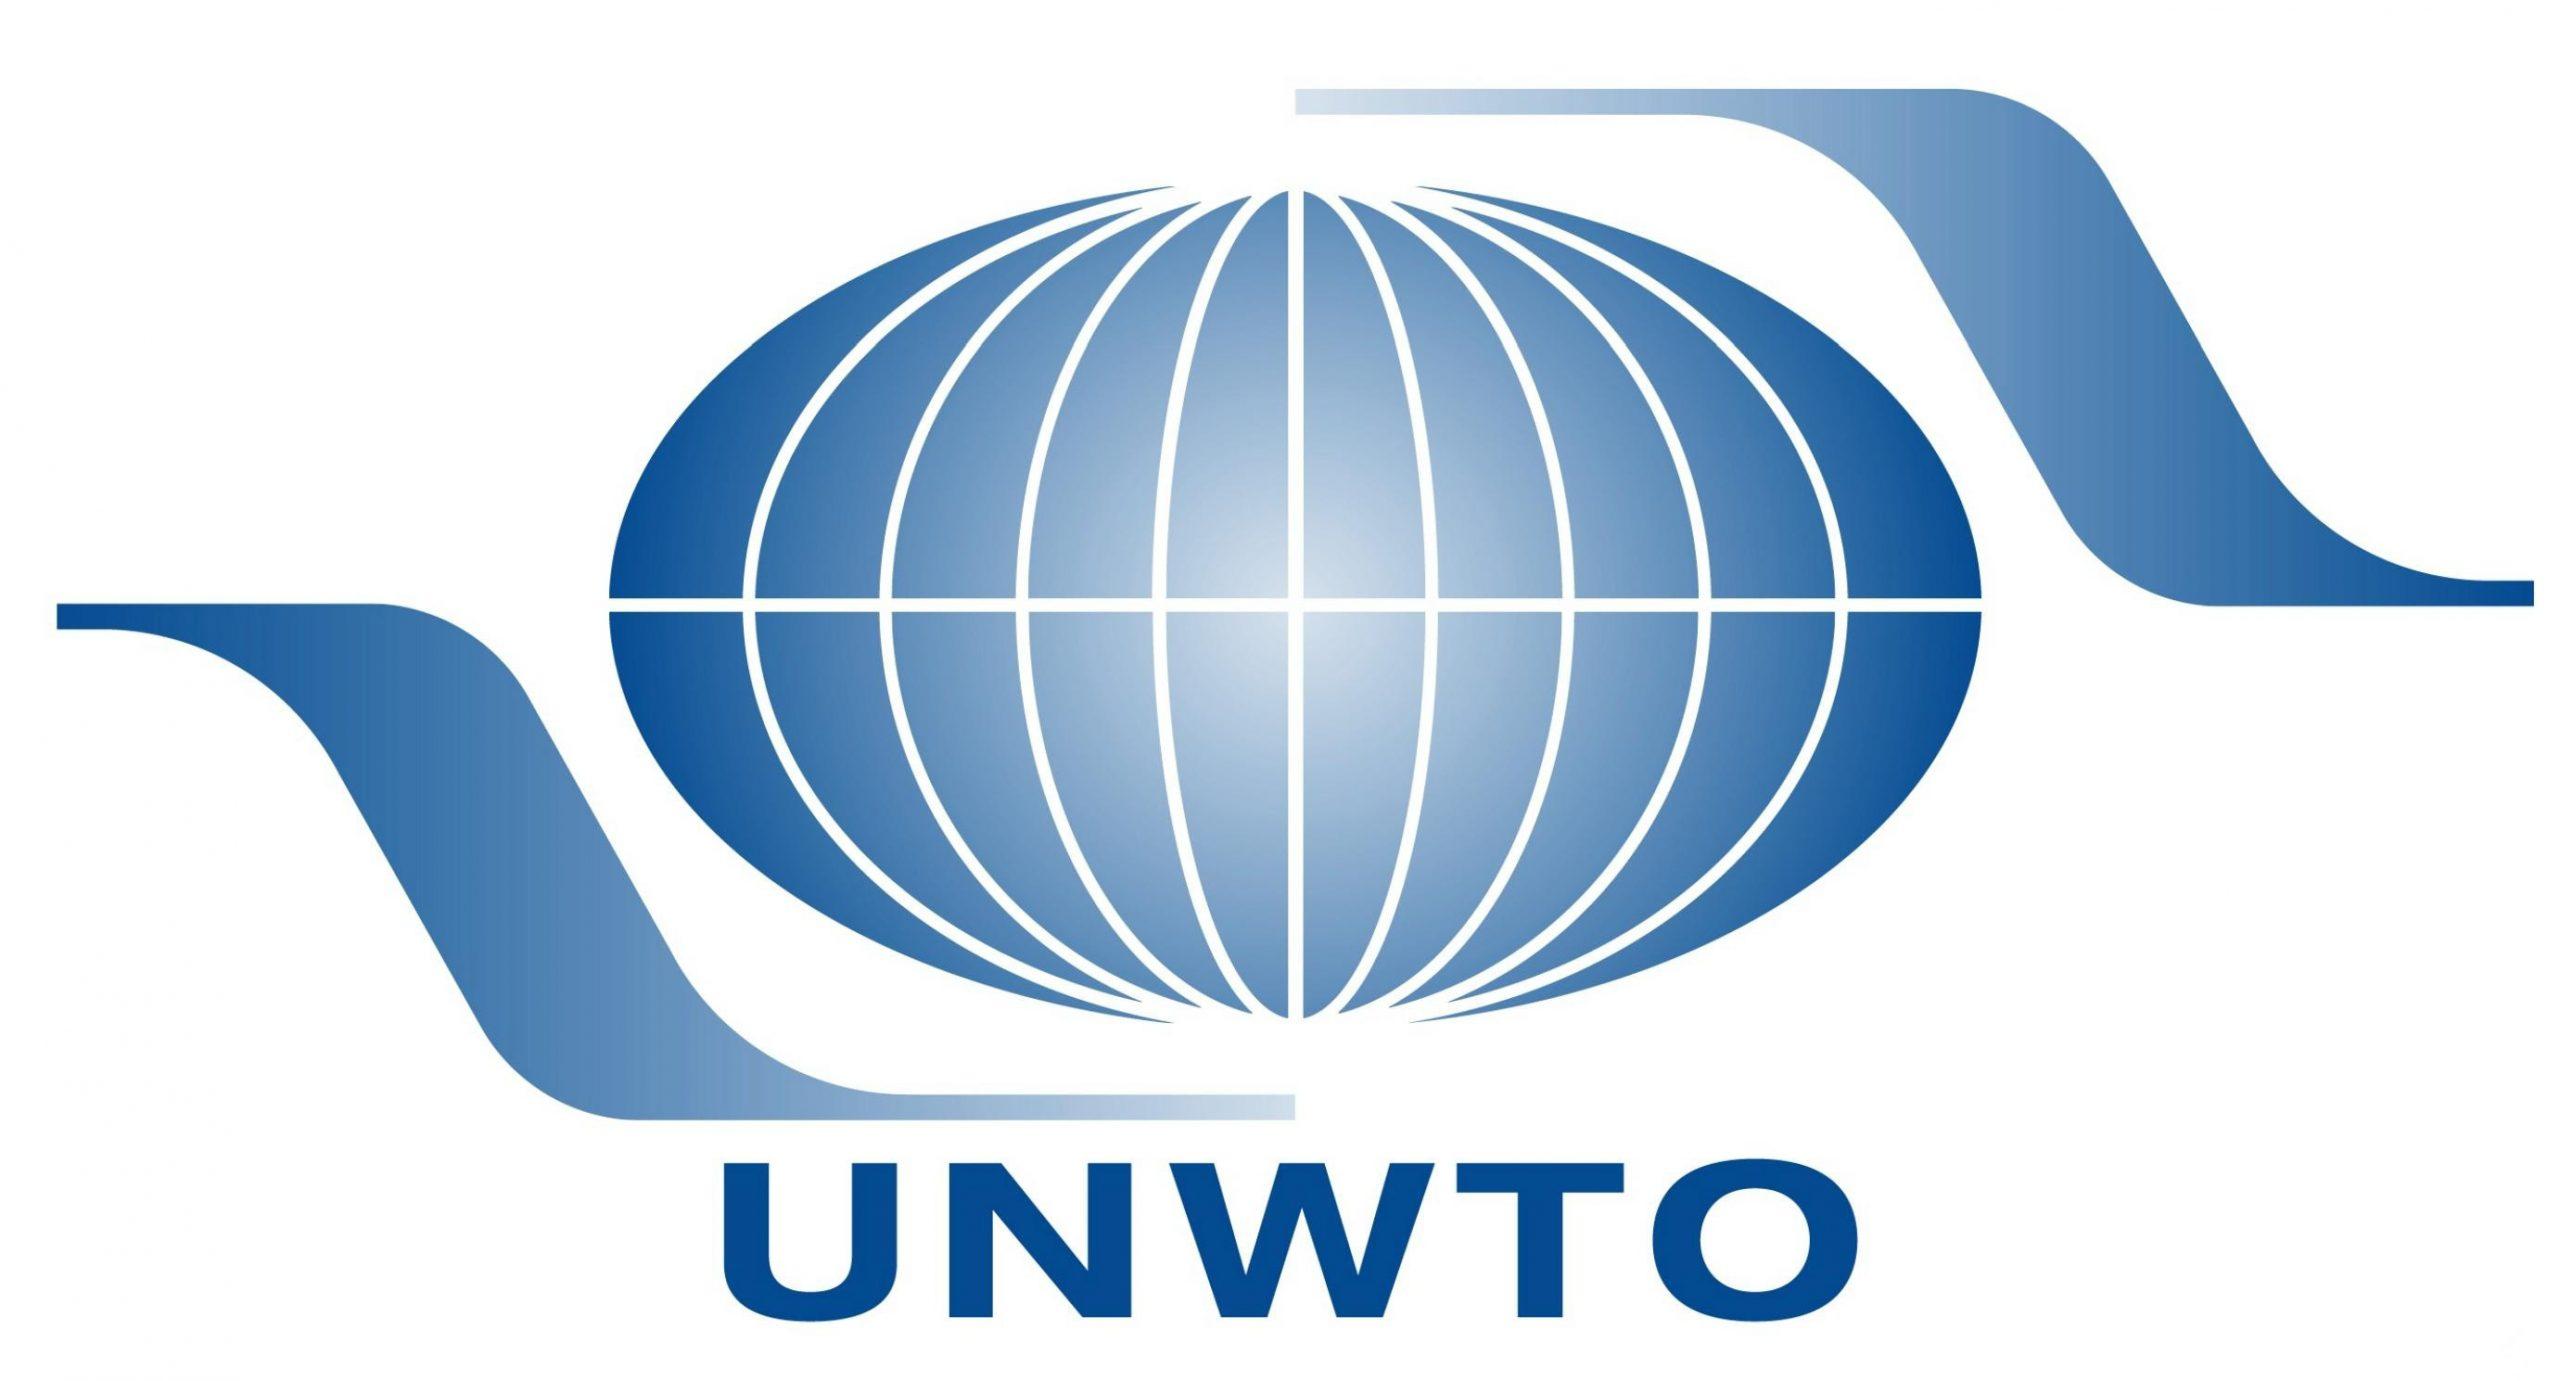 ٢٠٢٠١٢١٩ ١٦٢٥١٦ scaled - منظمة السياحة العالمية: جائحة كورونا تعيد السياحة ثلاثة عقود إلى الوراء